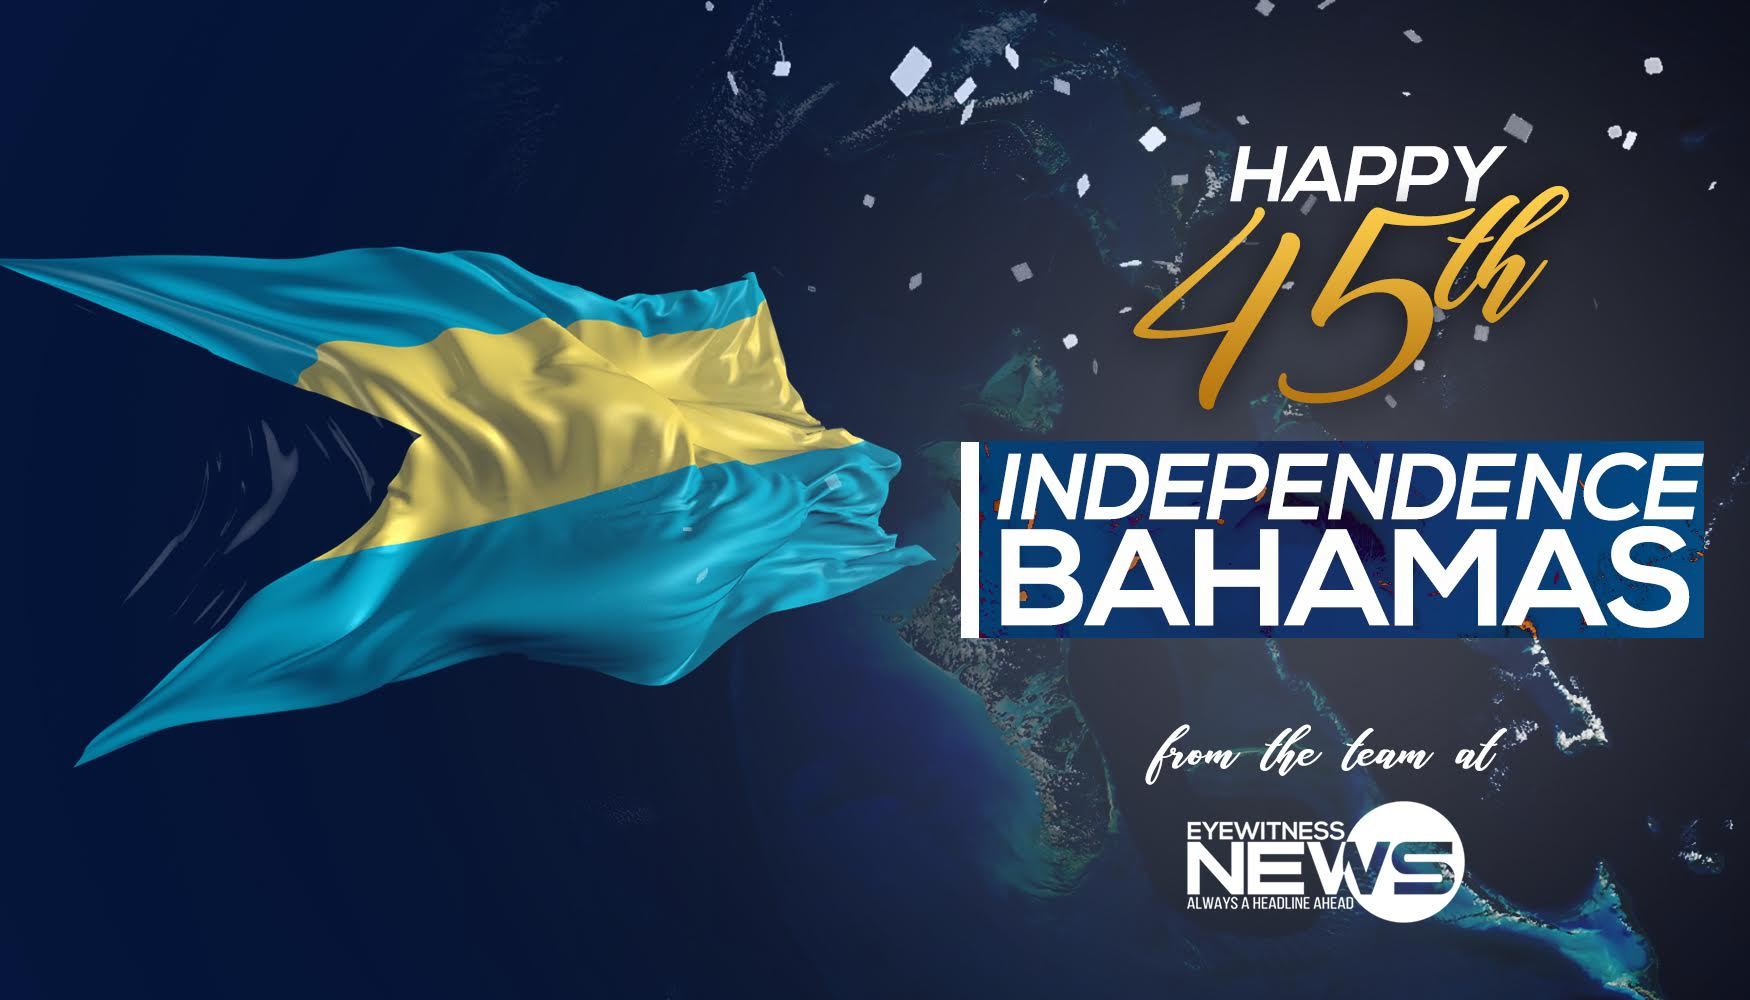 Happy Independence Bahamas!